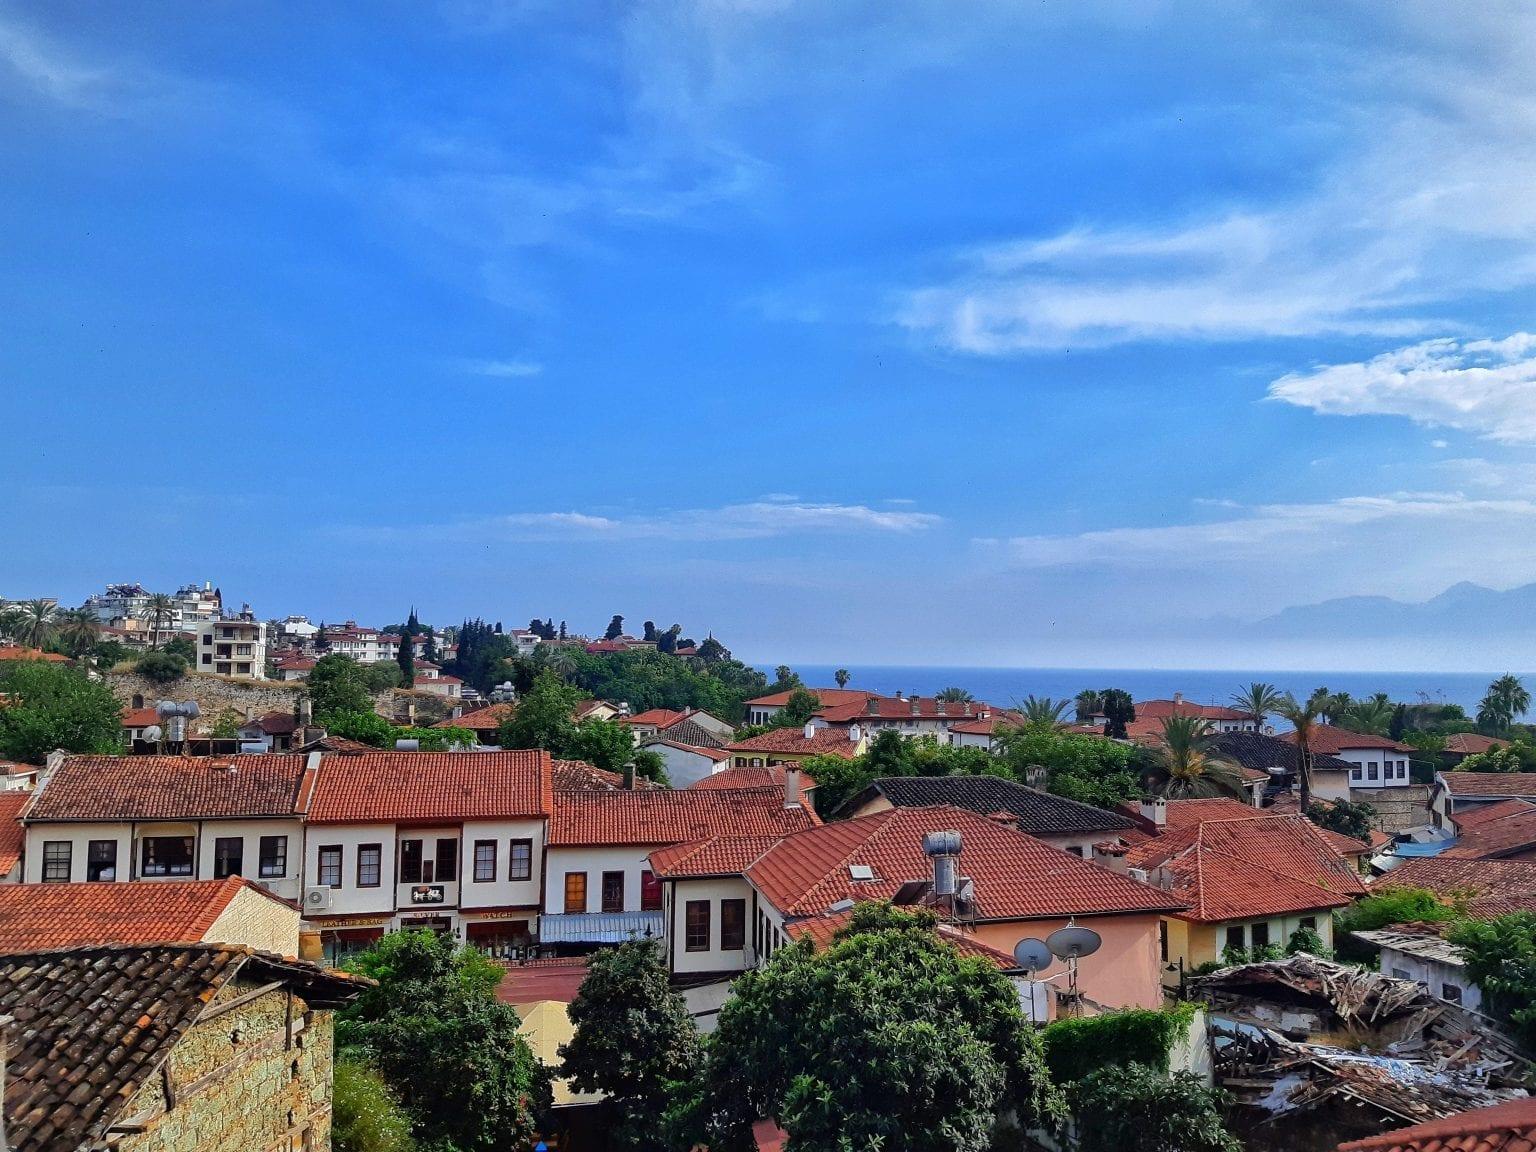 Cheap Property for Sale in Antalya Turkey